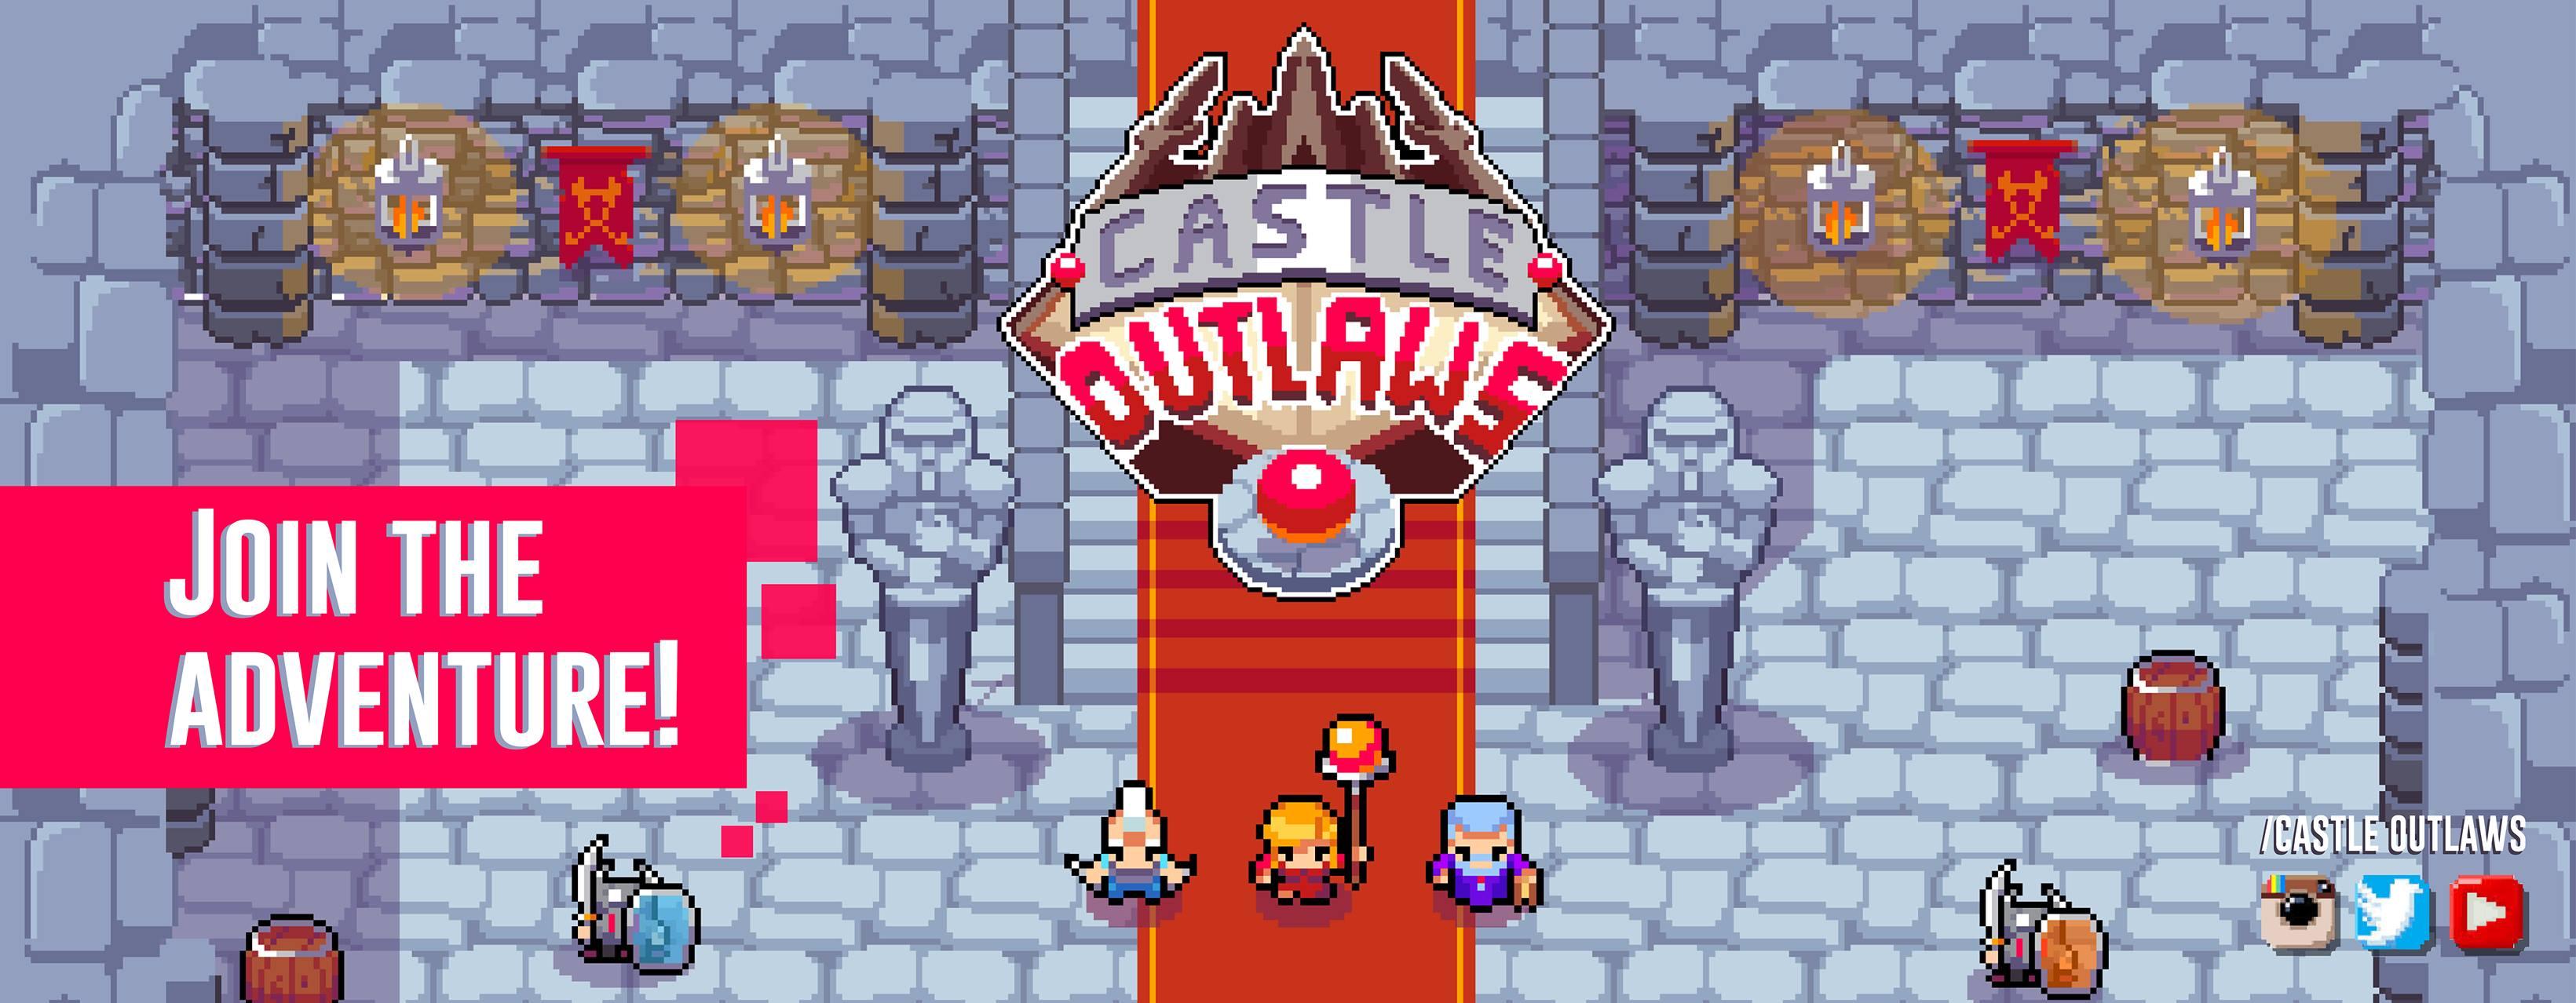 Castle Outlaws